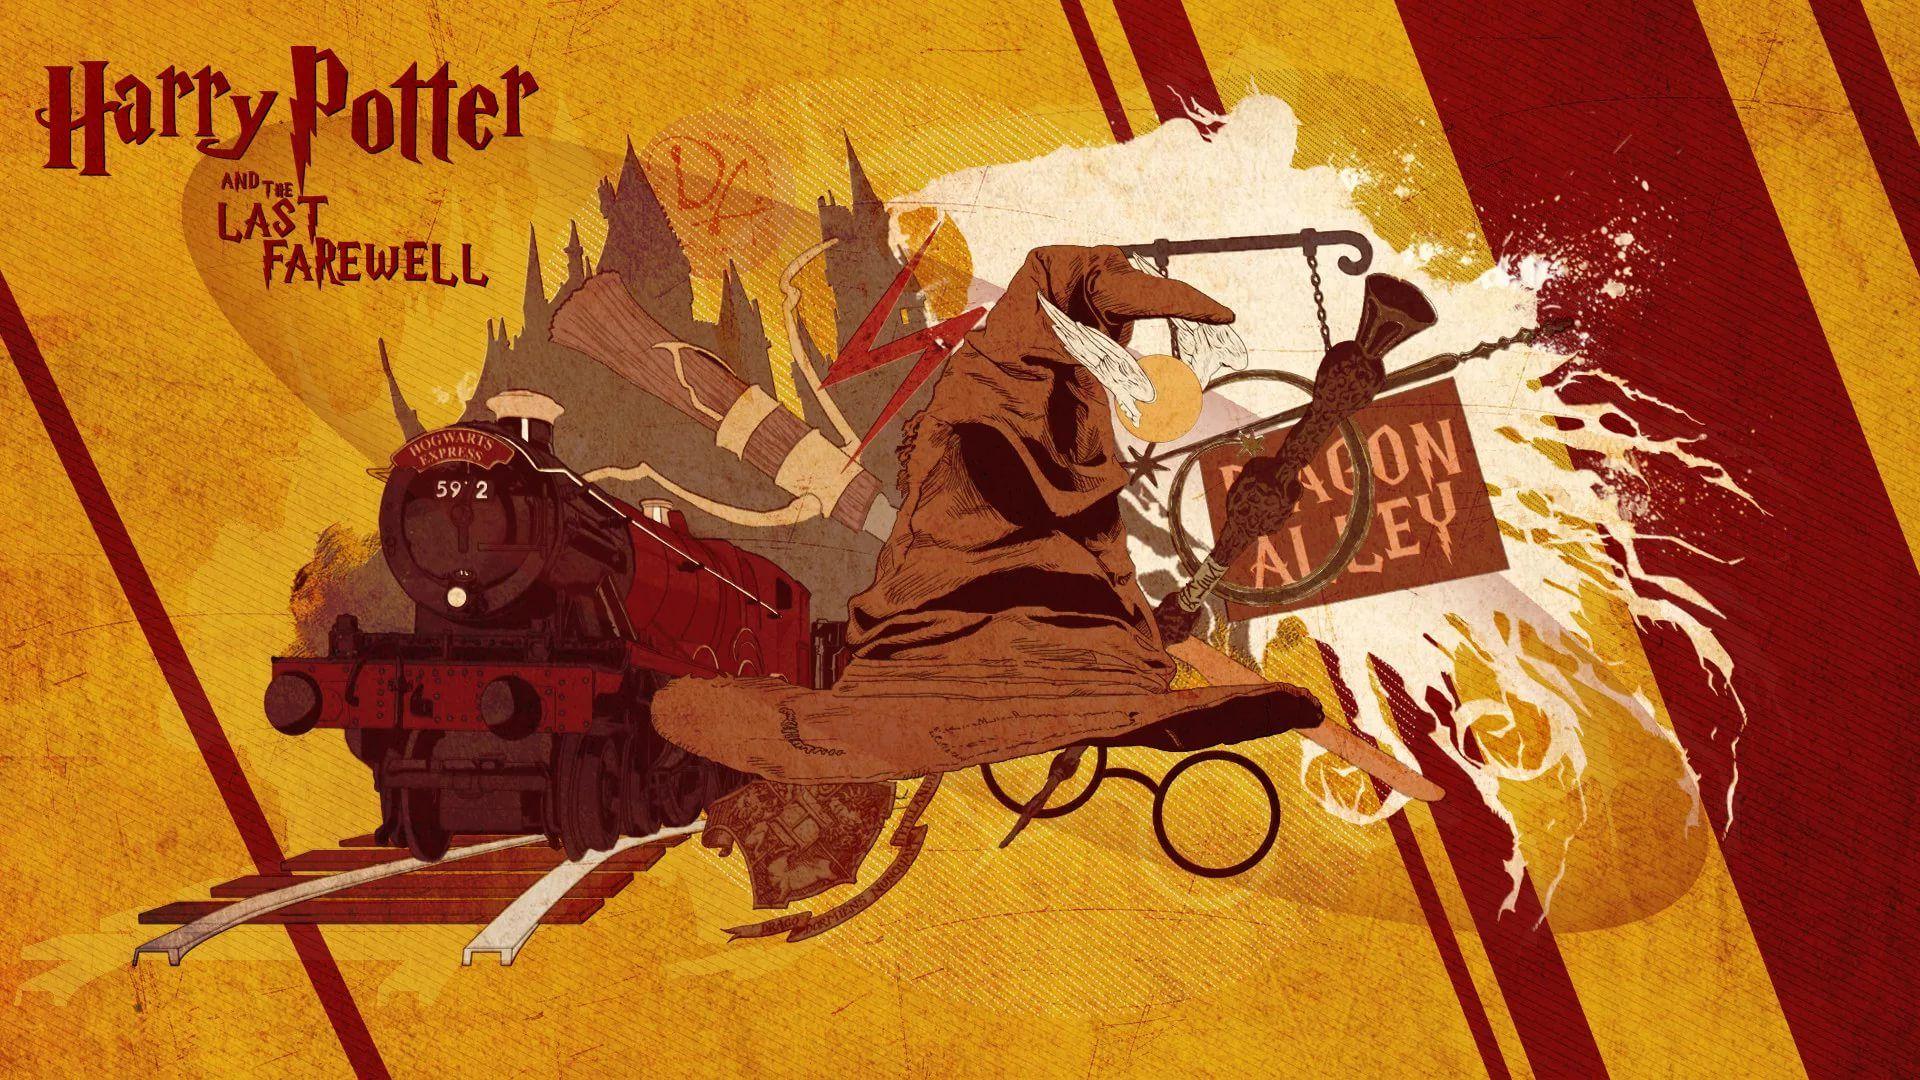 Harry Potter a wallpaper